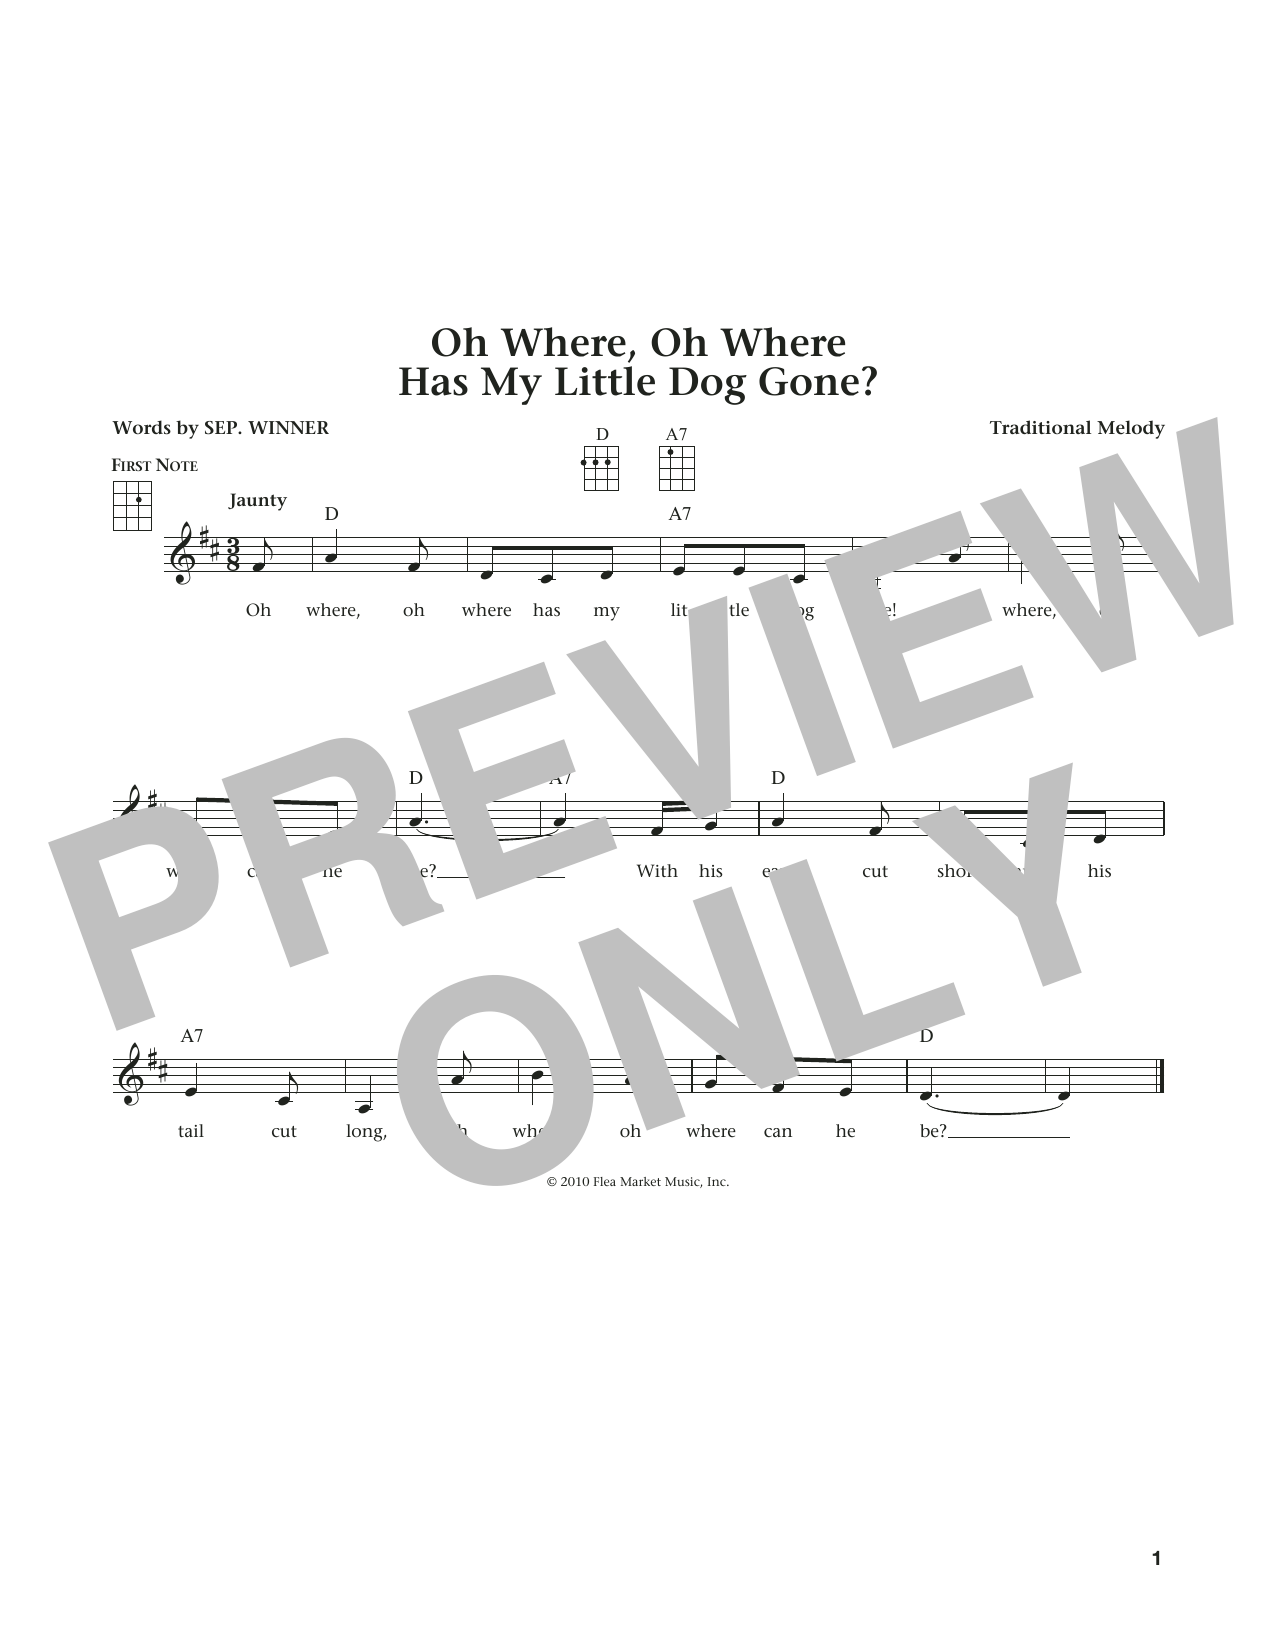 Oh Where, Oh Where Has My Little Dog Gone (from The Daily Ukulele) (arr. Liz and Jim Beloff) (Ukulele)